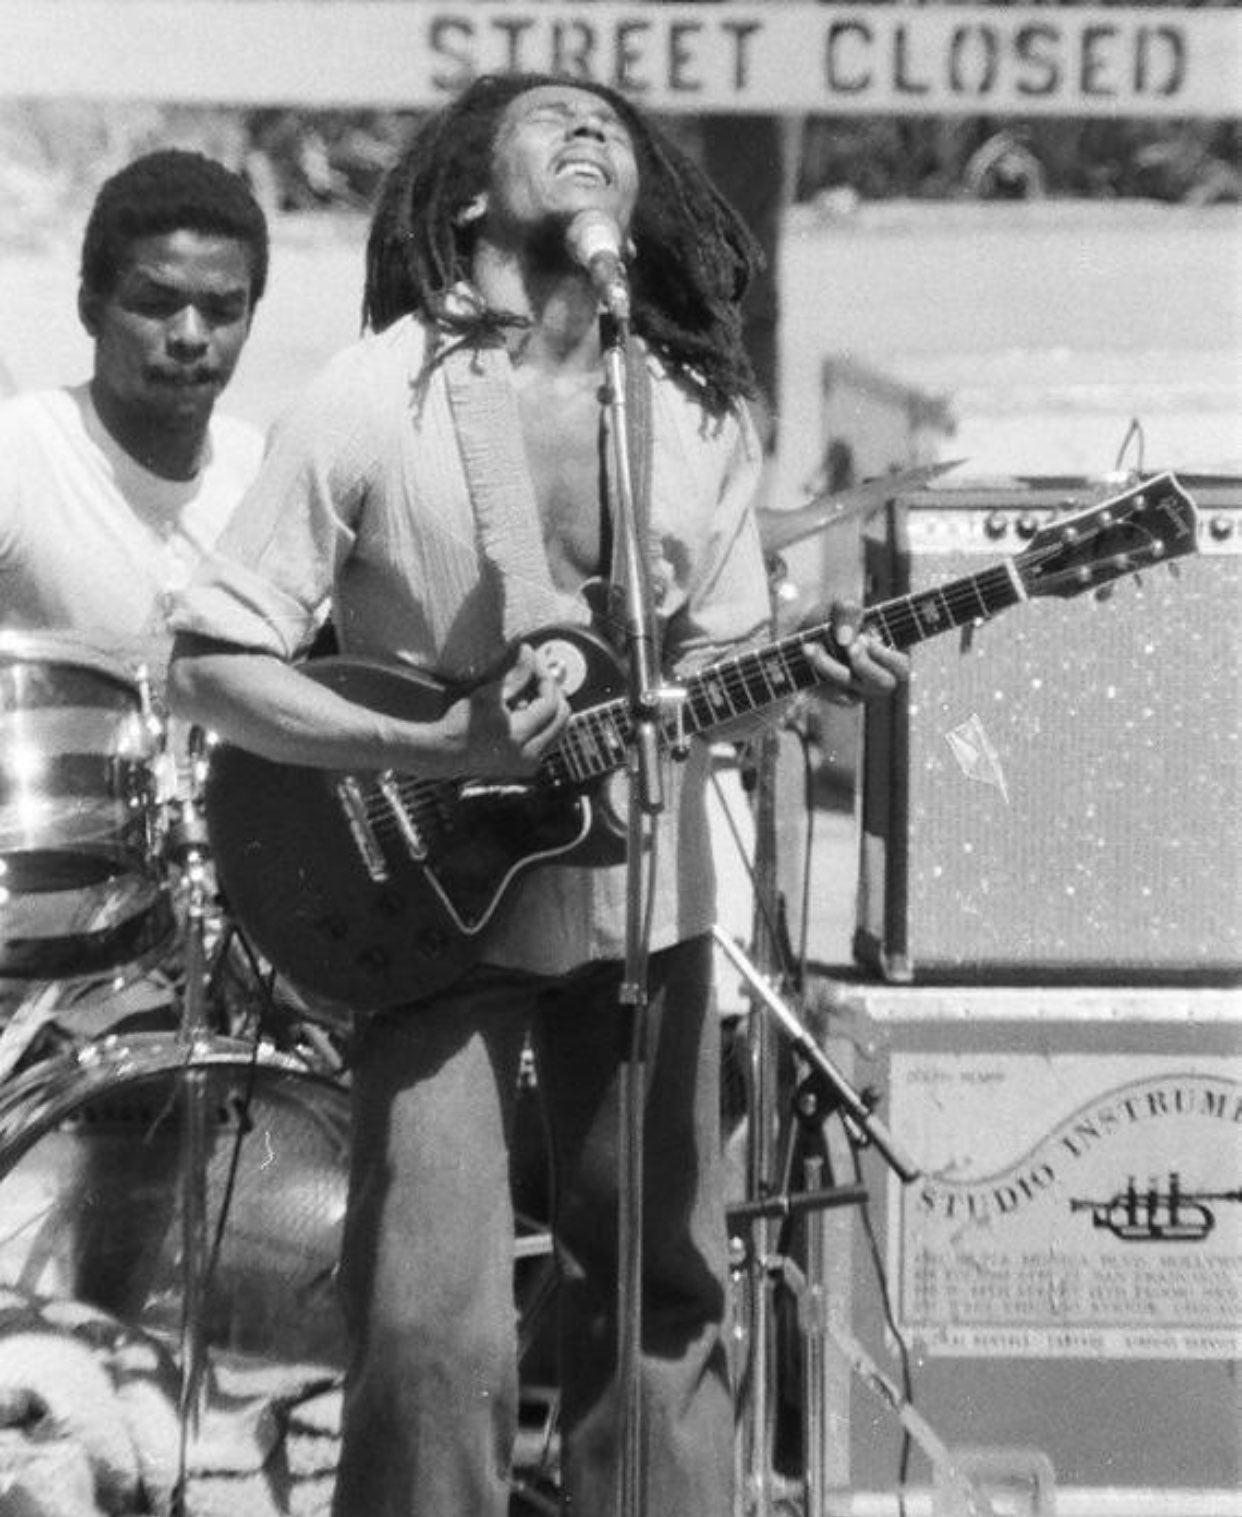 Bob Marley Musician 8x10 Photo Print